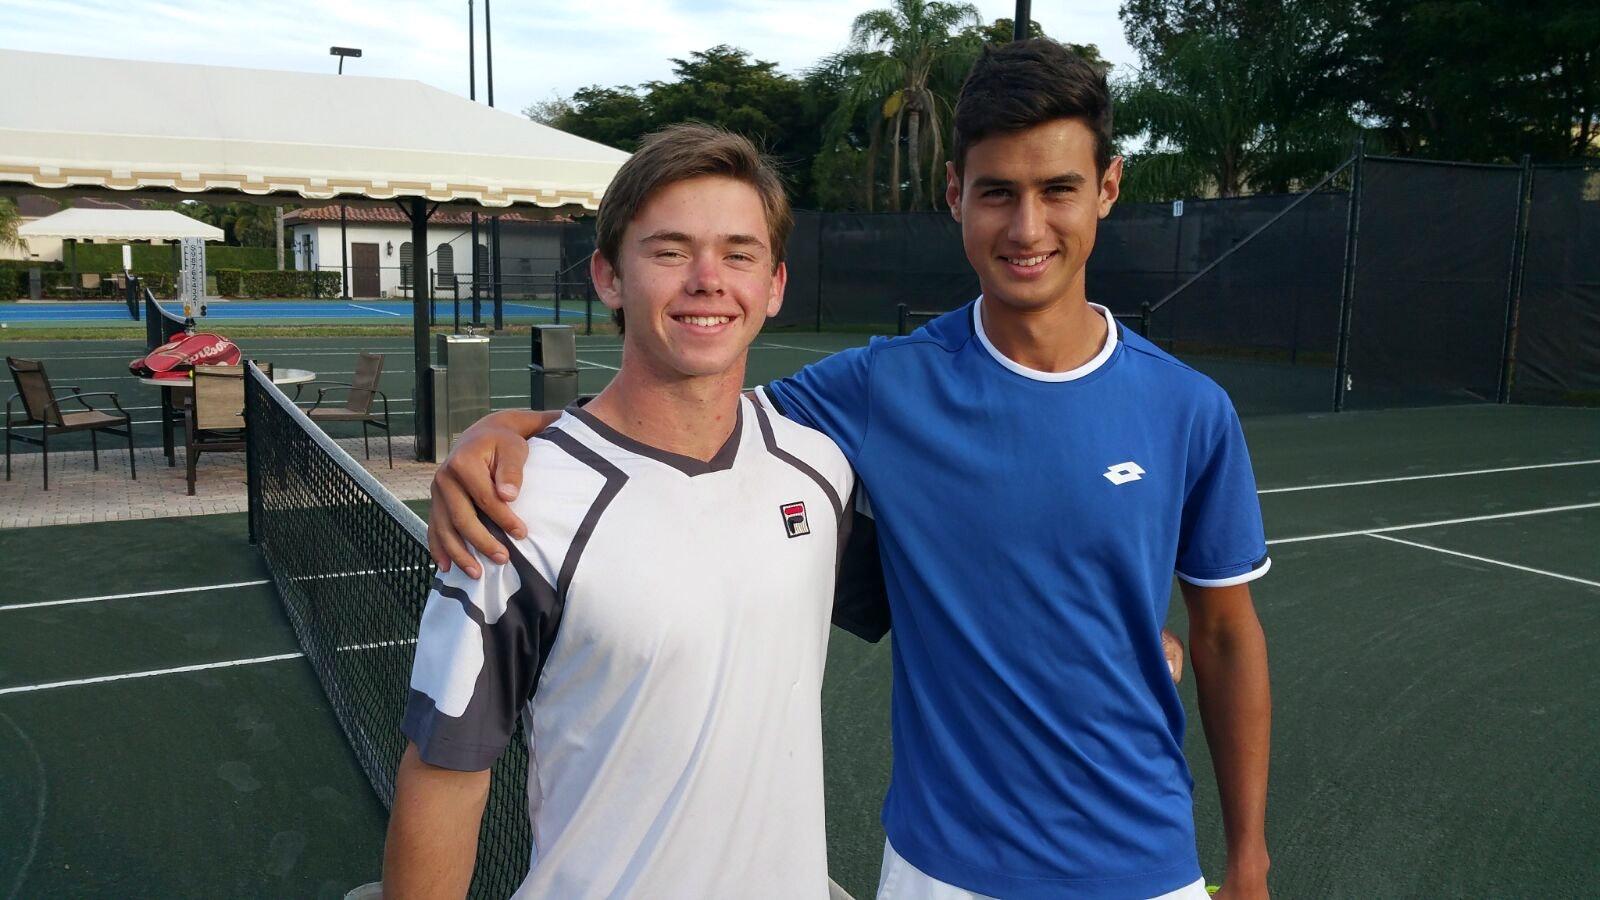 John J. teaches tennis lessons in Chapel Hill, NC